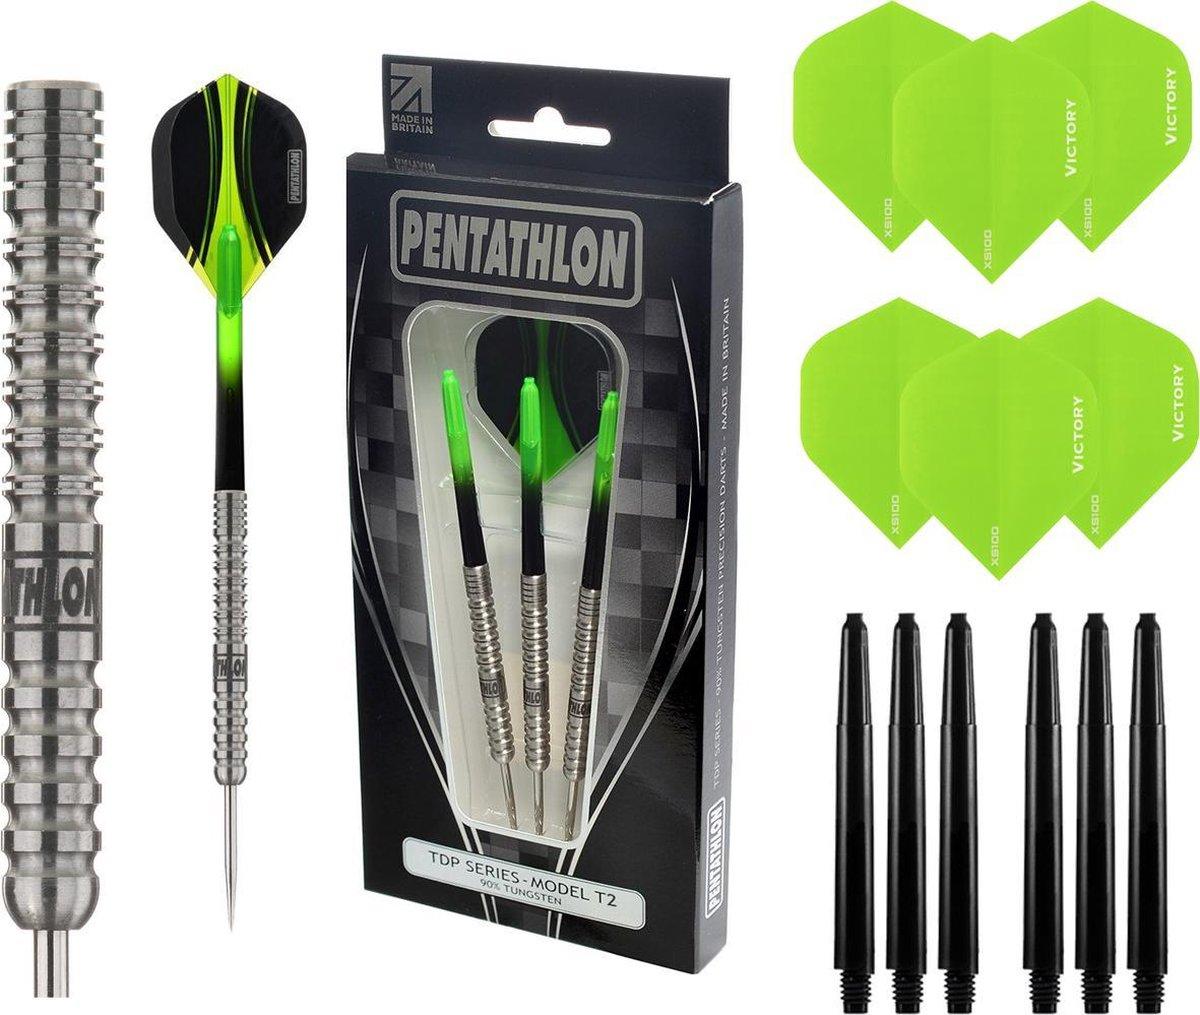 Pentathlon - T2 Groen 24 gram 90% Tungsten - dartpijlen - inclusief bijpassende - darts shafts - en - darts flights